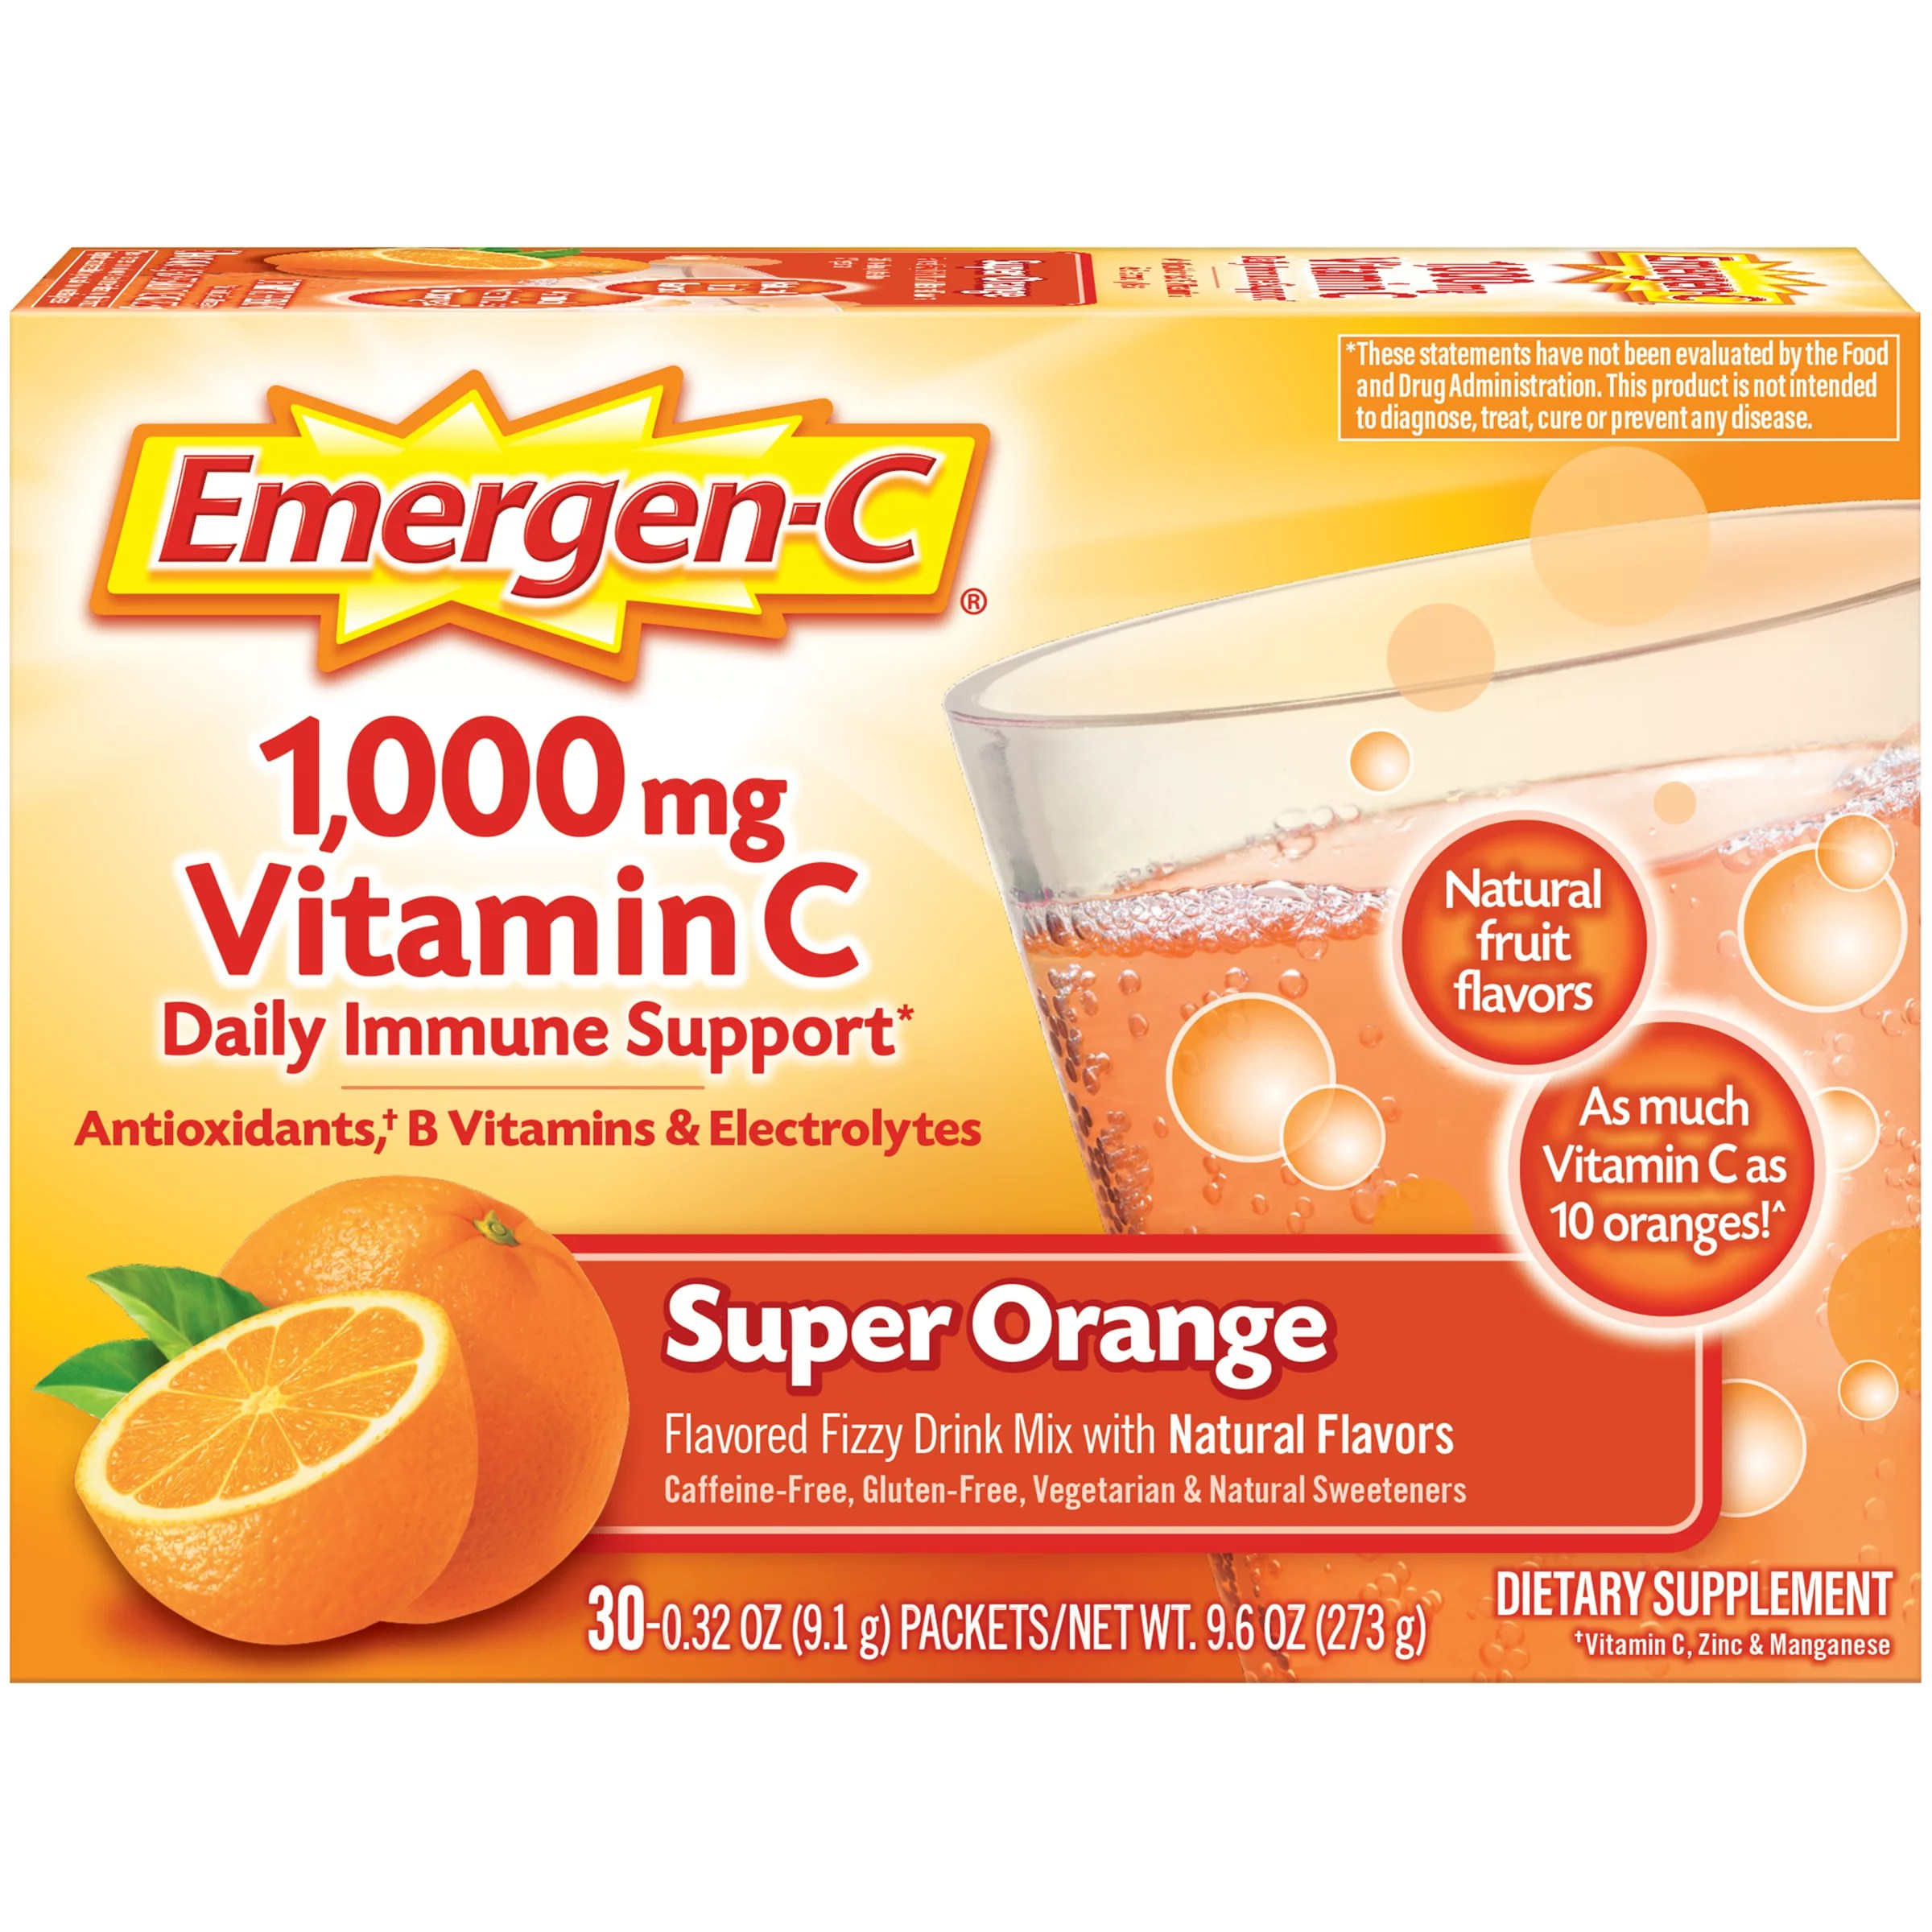 Emergen-C 1000mg Vitamin C Powder, with Antioxidants, B Vitamins and Electrolytes for Immune Support, Caffeine Free Vitamin C Supplement Fizzy Drink Mix, Super Orange Flavor – 30 Count/1 Month Supply